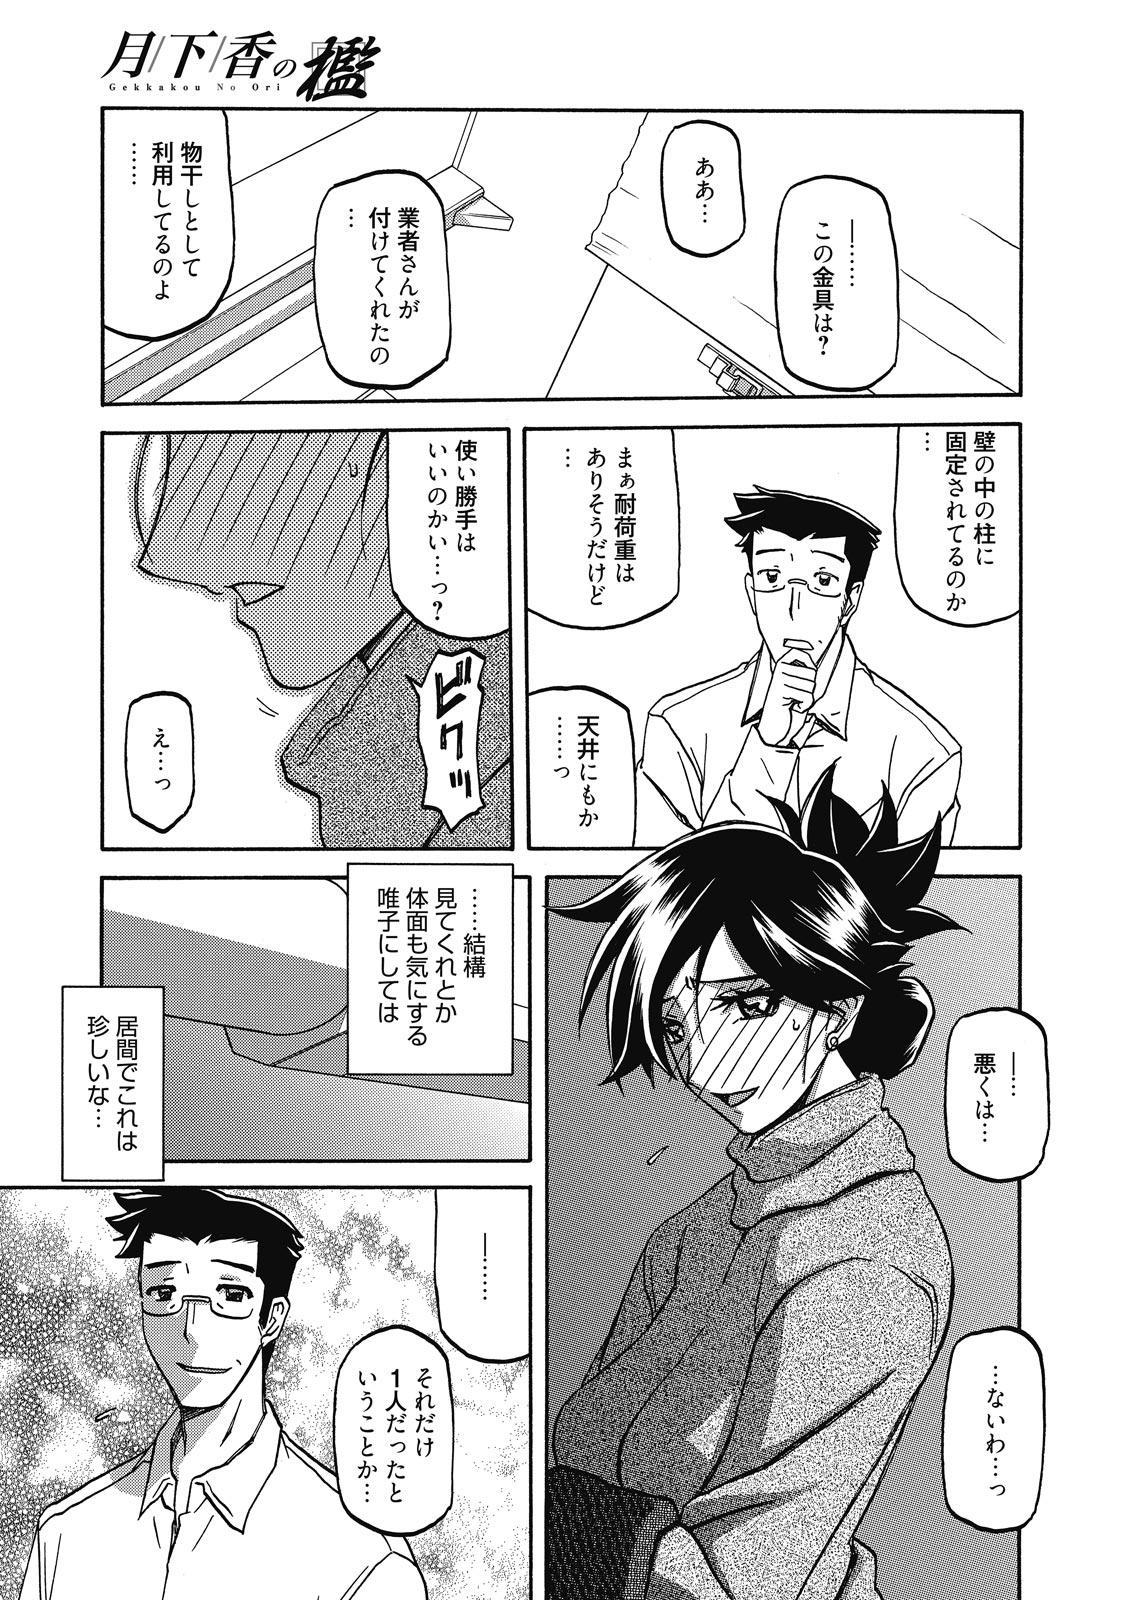 Web Manga Bangaichi Vol. 7 52